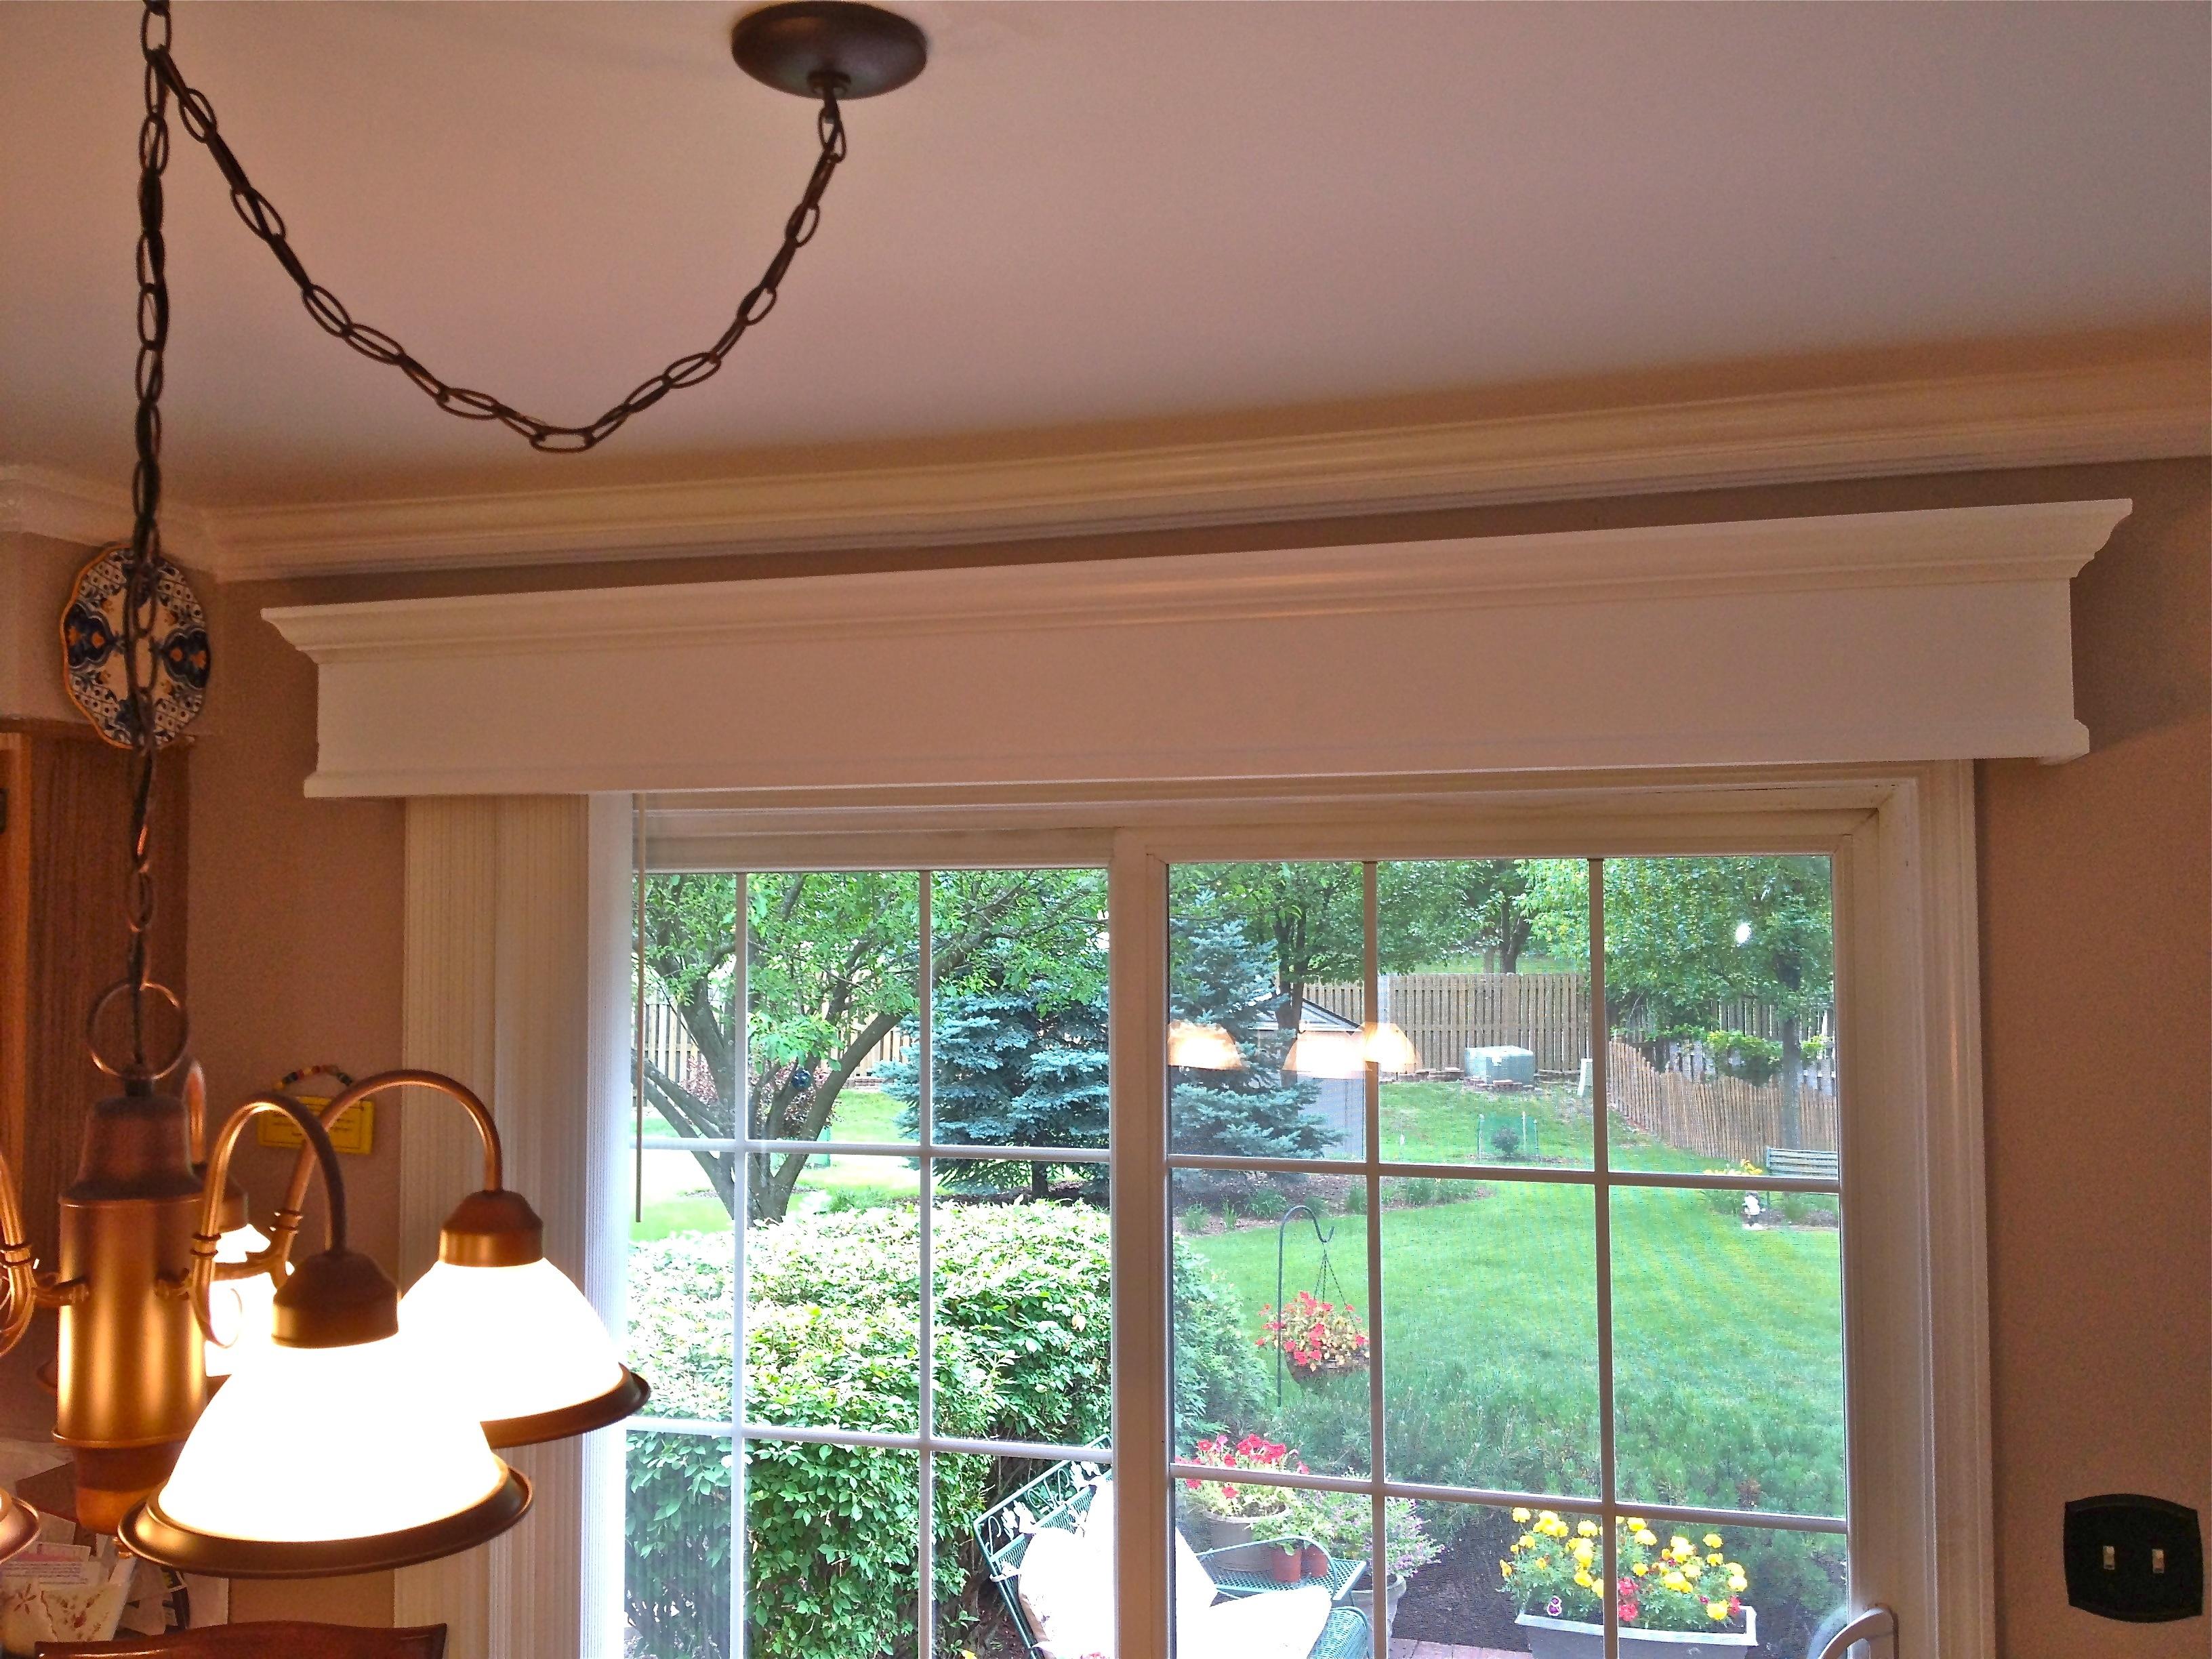 Sliding Door Wood Valancewooden valance with vertical blinds for patio door home decor